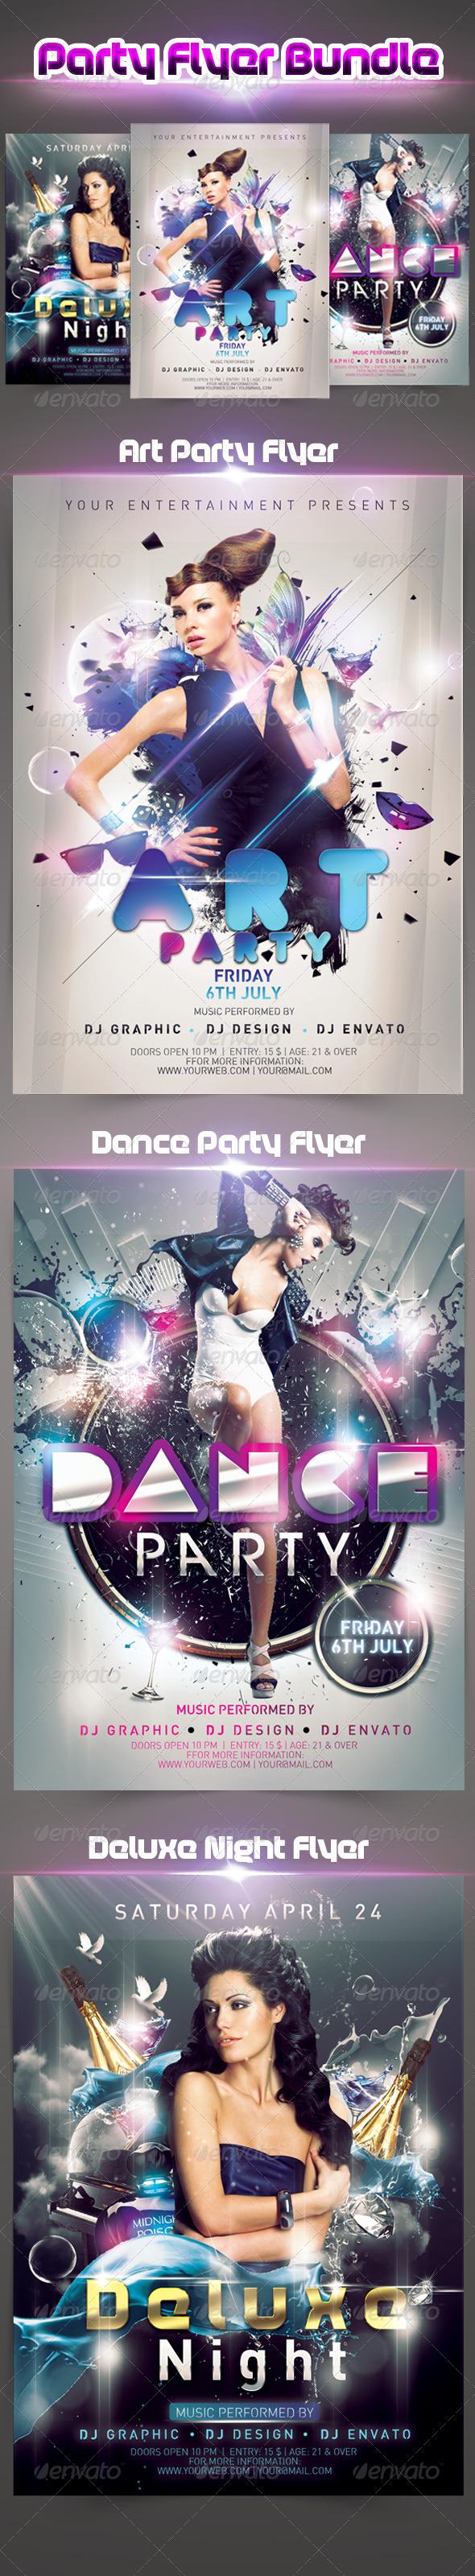 GraphicRiver Party Flyer Bundle 5028233